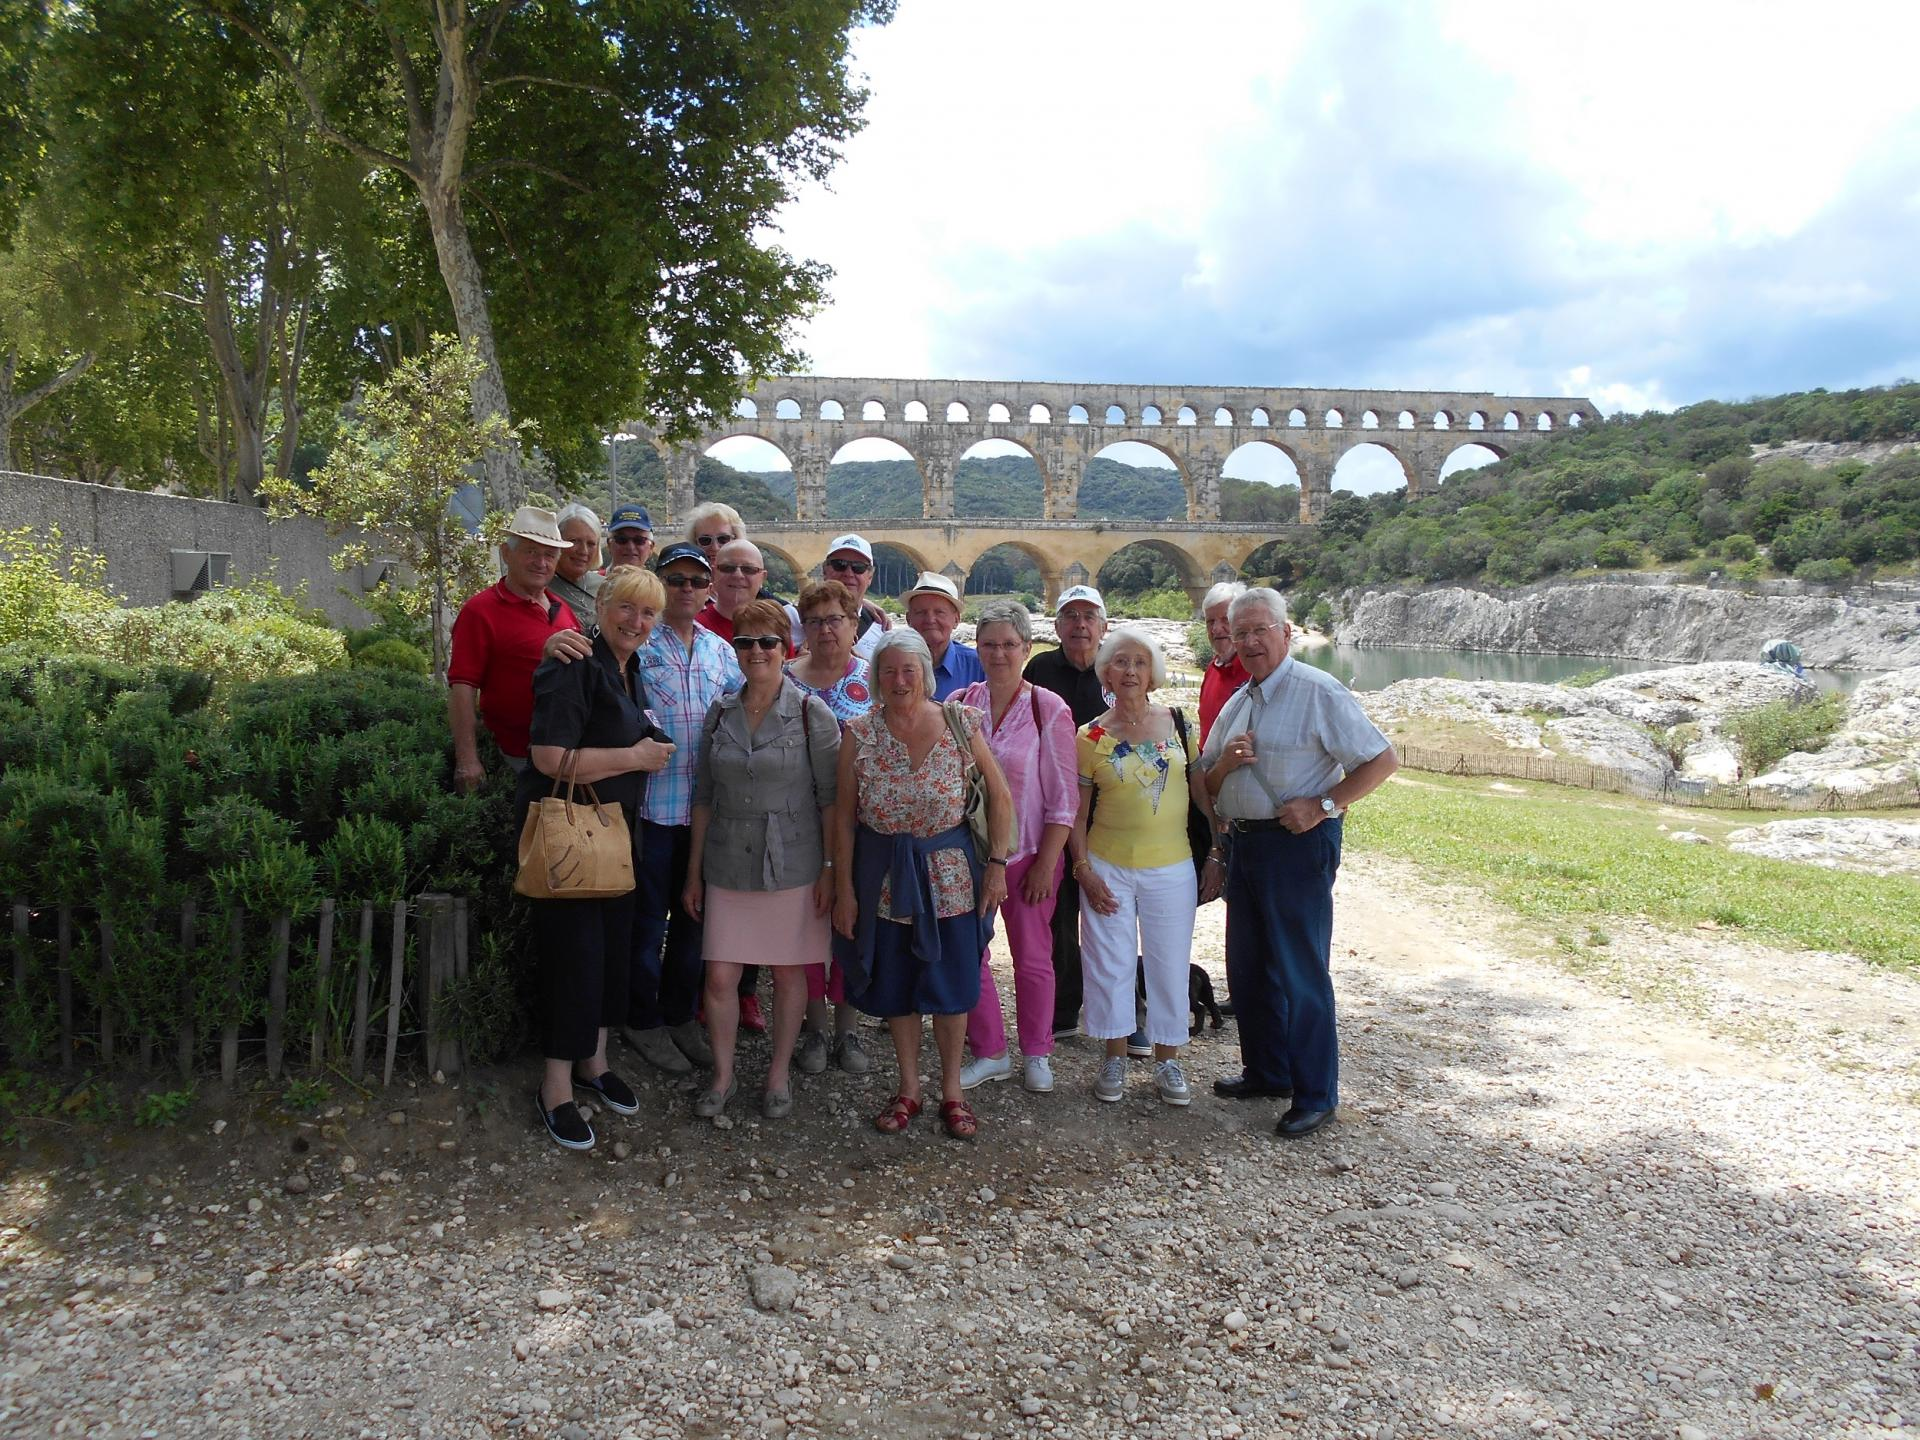 Lundi 6 juin Au Pont du Gard